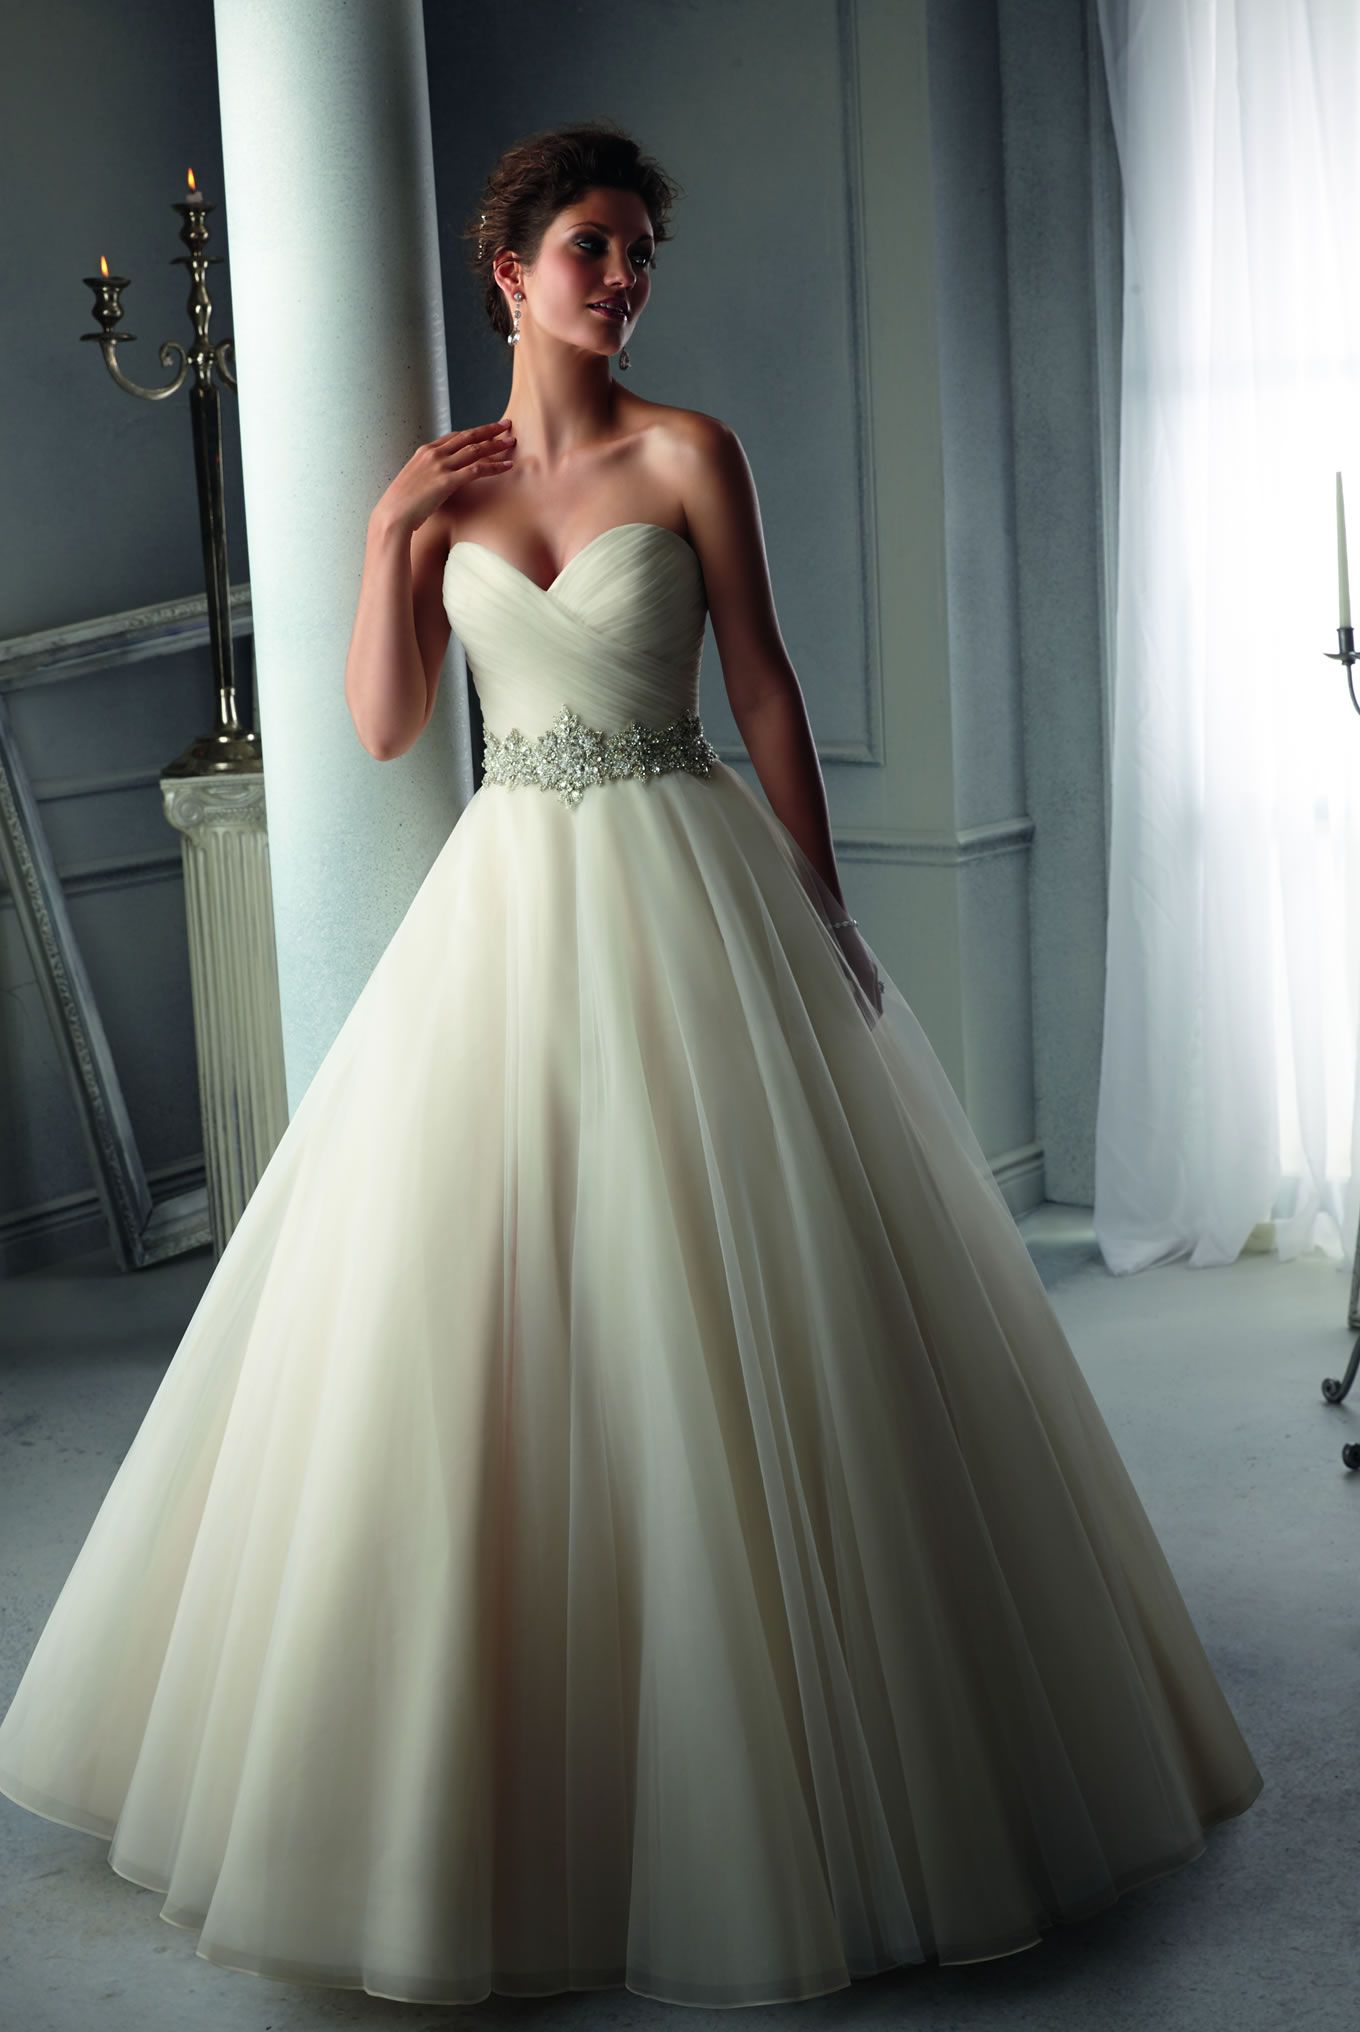 Pin by vivian on weddings pinterest wedding dresses wedding and